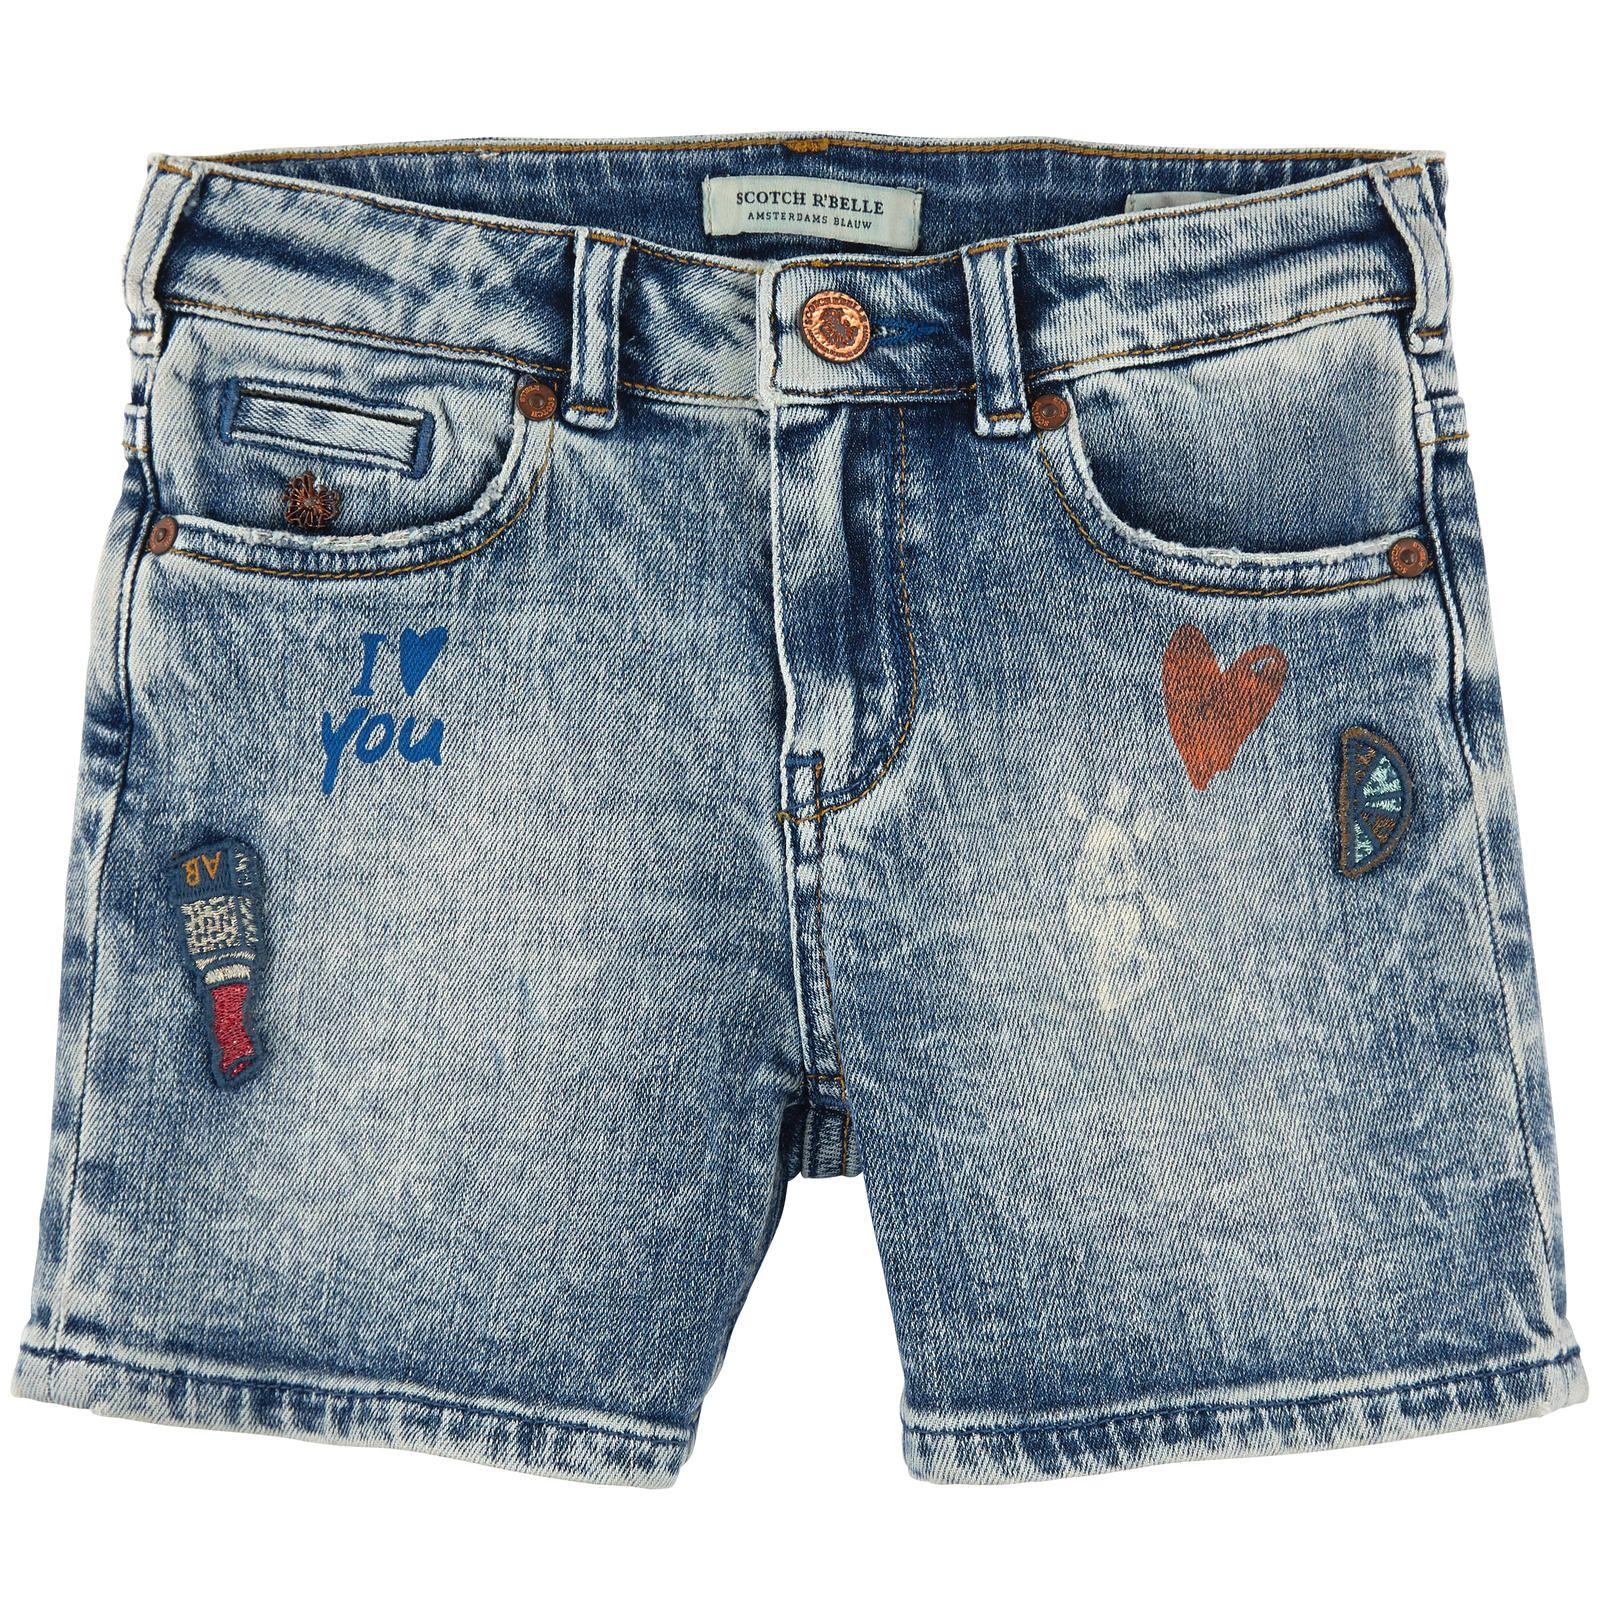 Scotch & Soda Stretch denim shorts - Stone-washed blue - 101917